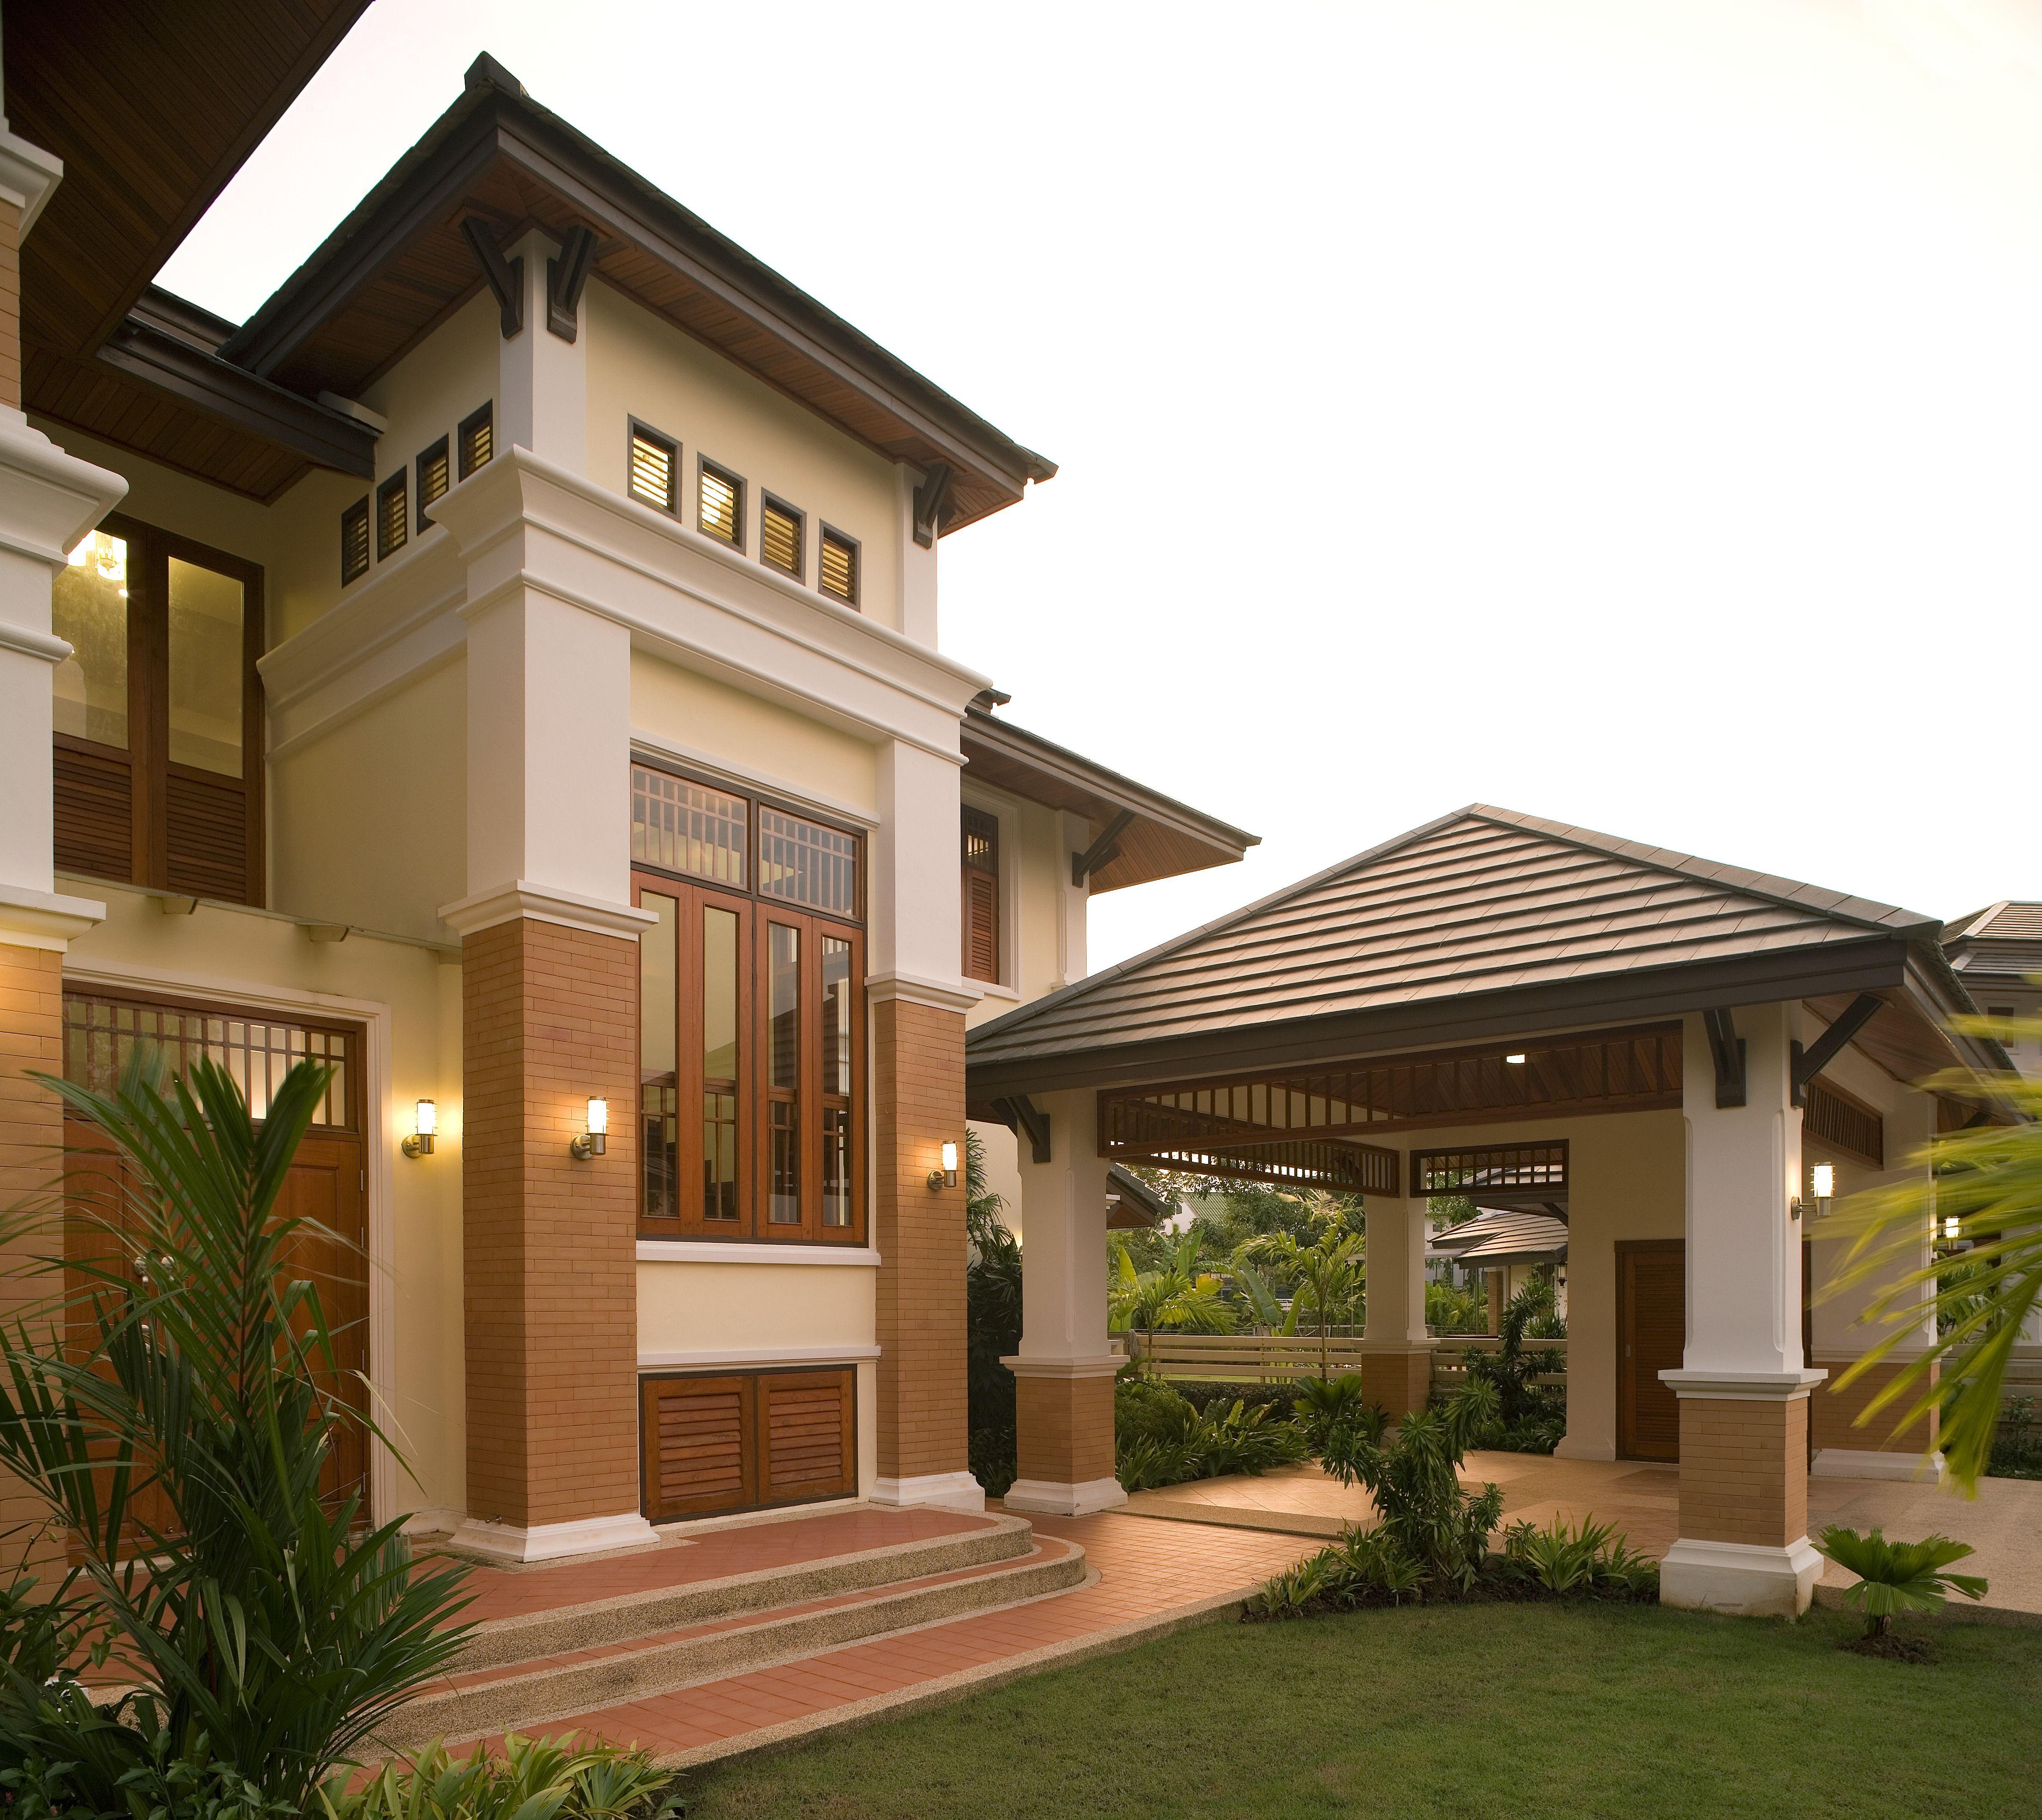 Popular House Paint Colors For 2014 House Exterior House Design Photos Model House Plan